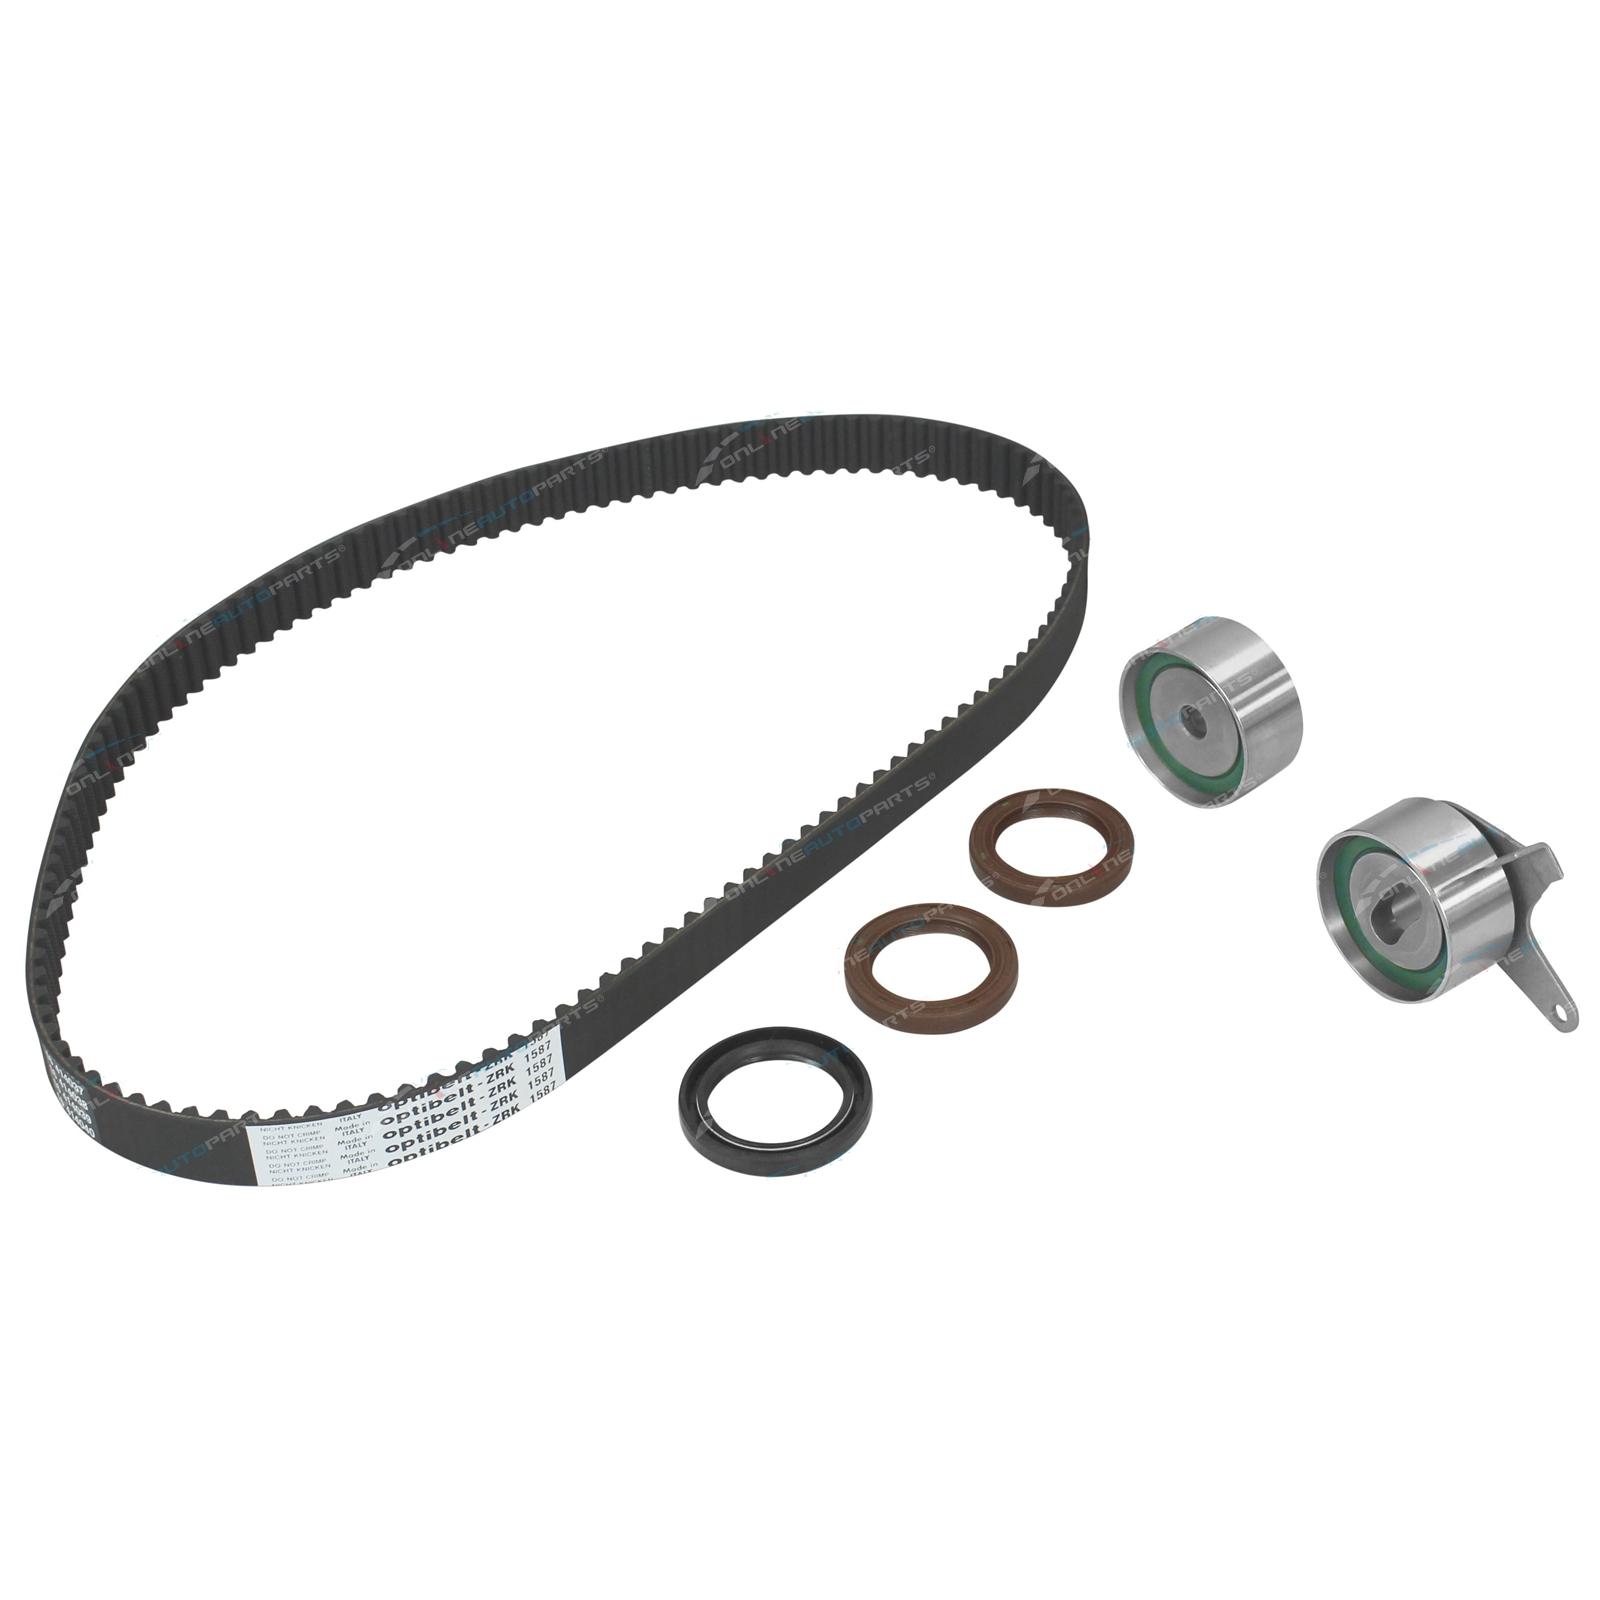 Timing Belt + Tensioner Kit Mazda 323 BJ 1998-2002 ZM 1.6L 1598cc MPI 16v DOHC Engine Protege Astina